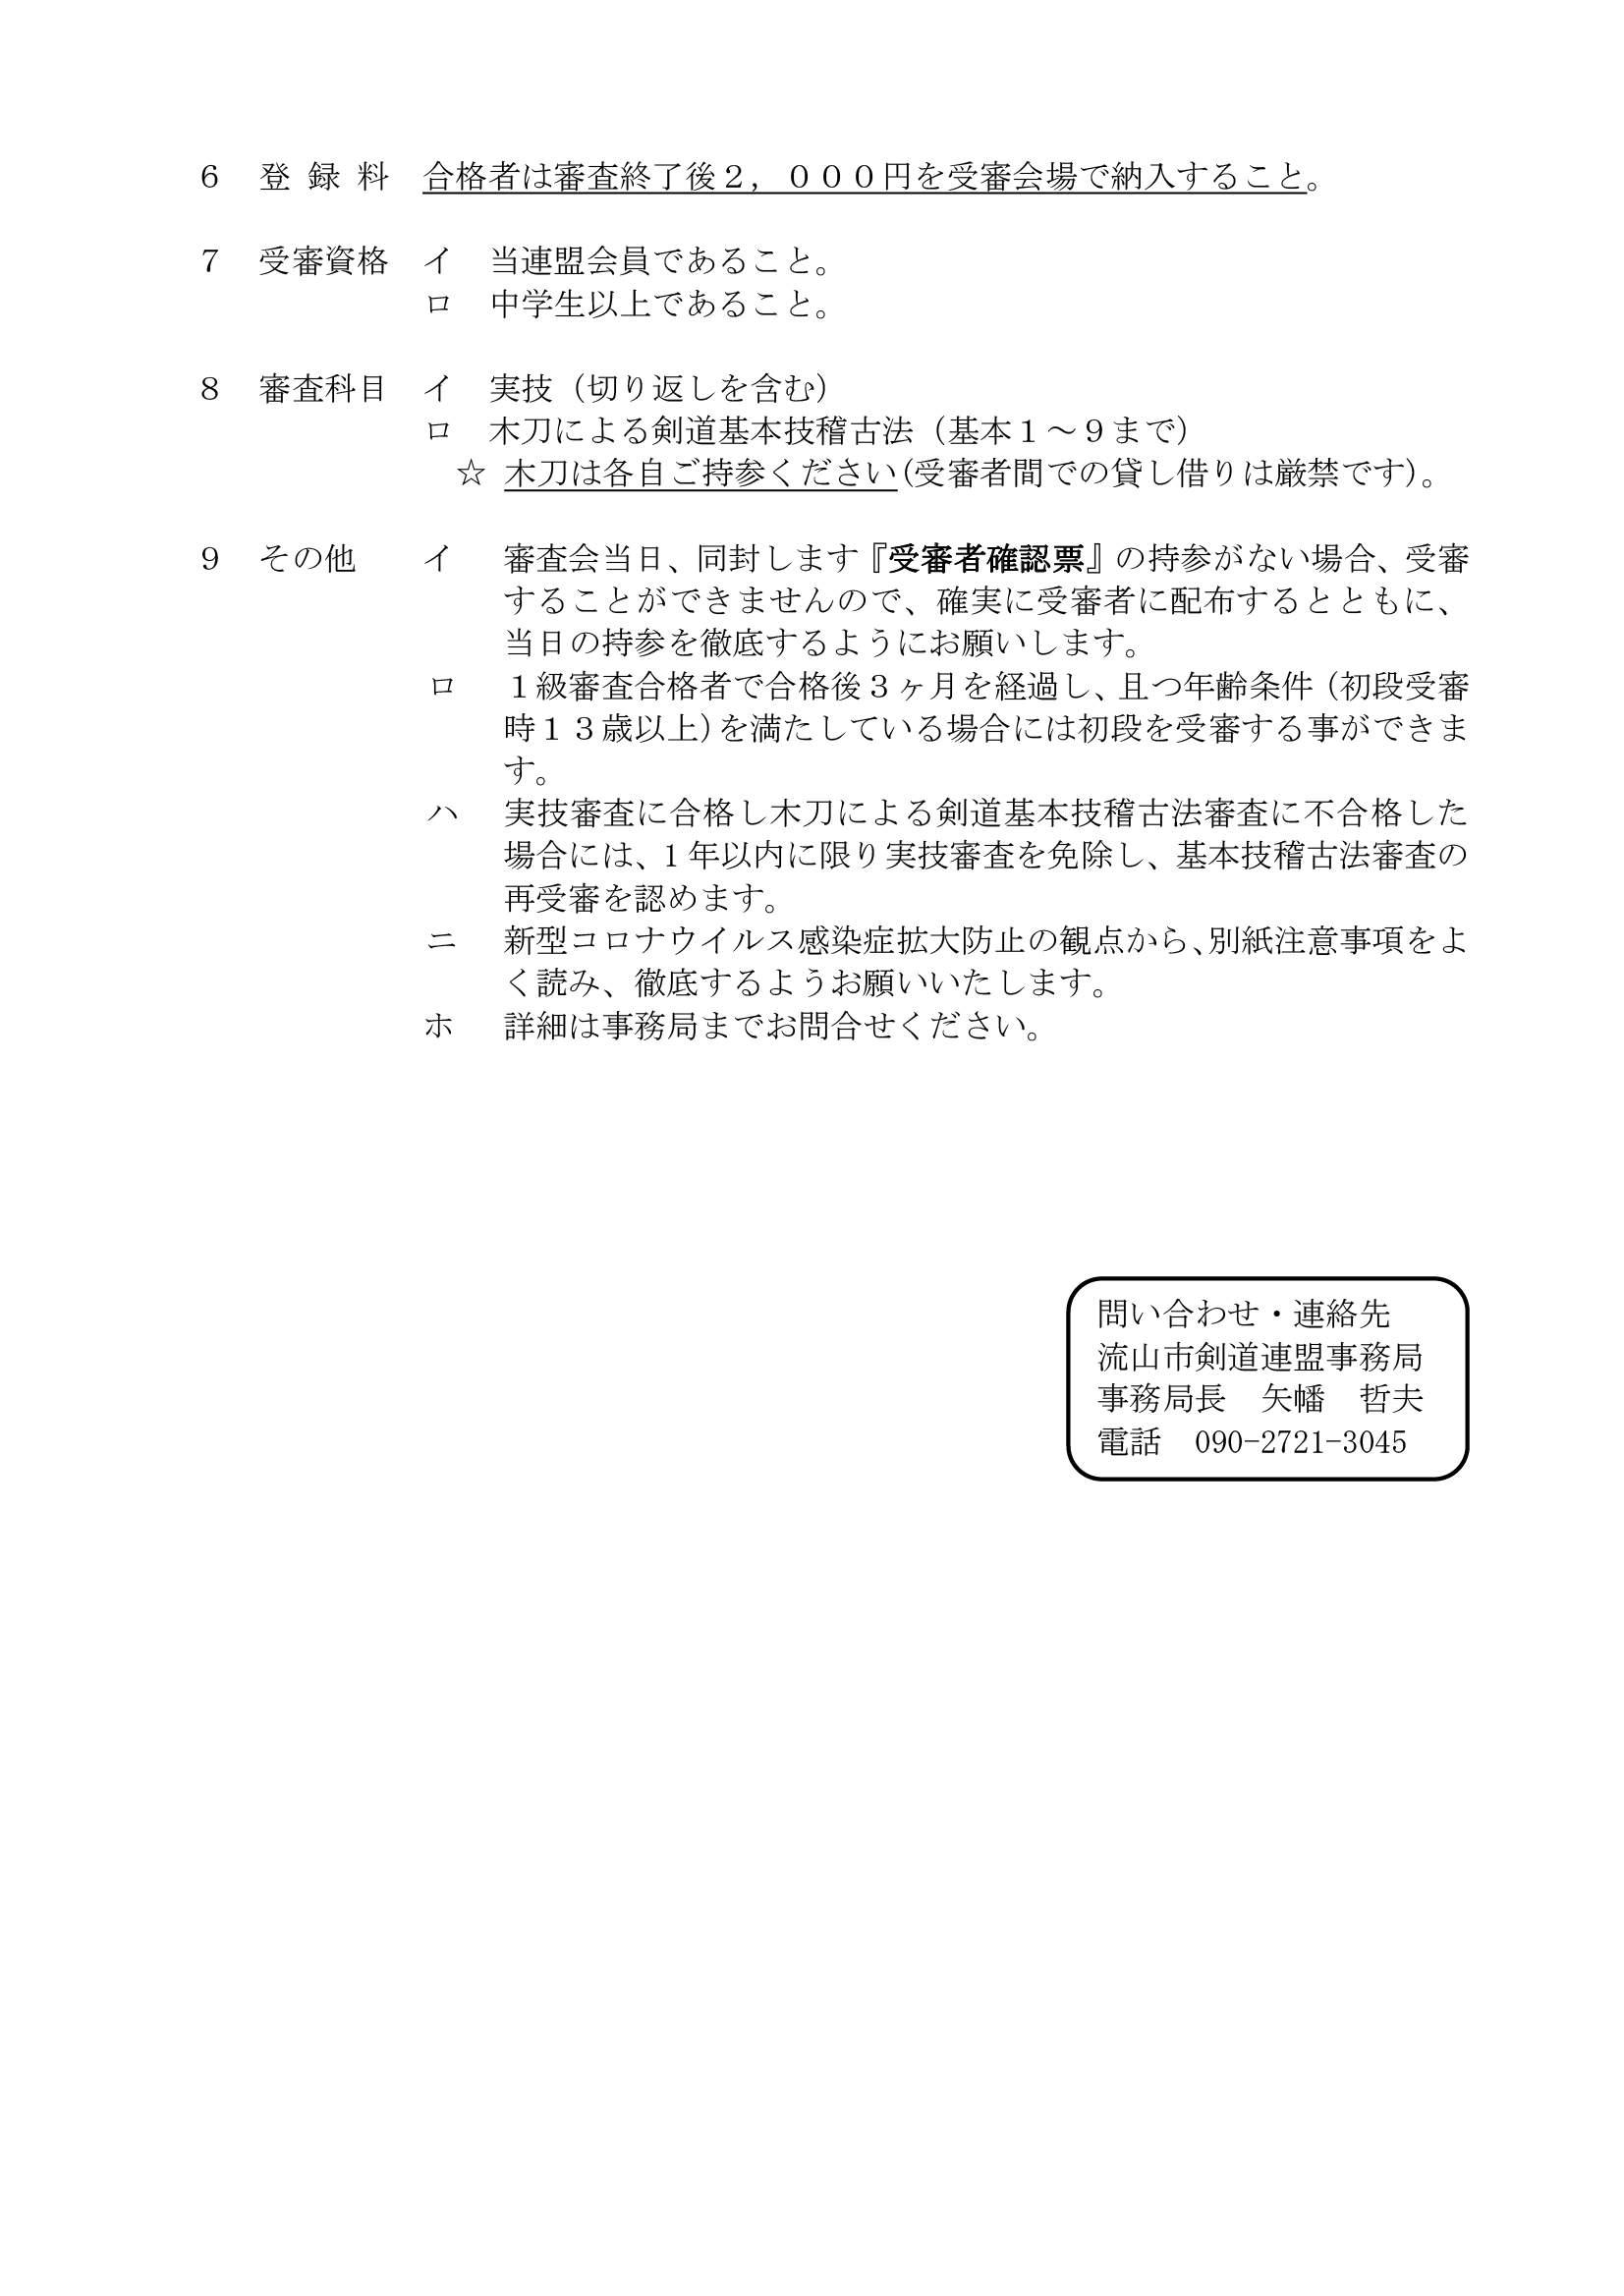 HP用1級審査会案内R3-4_0002